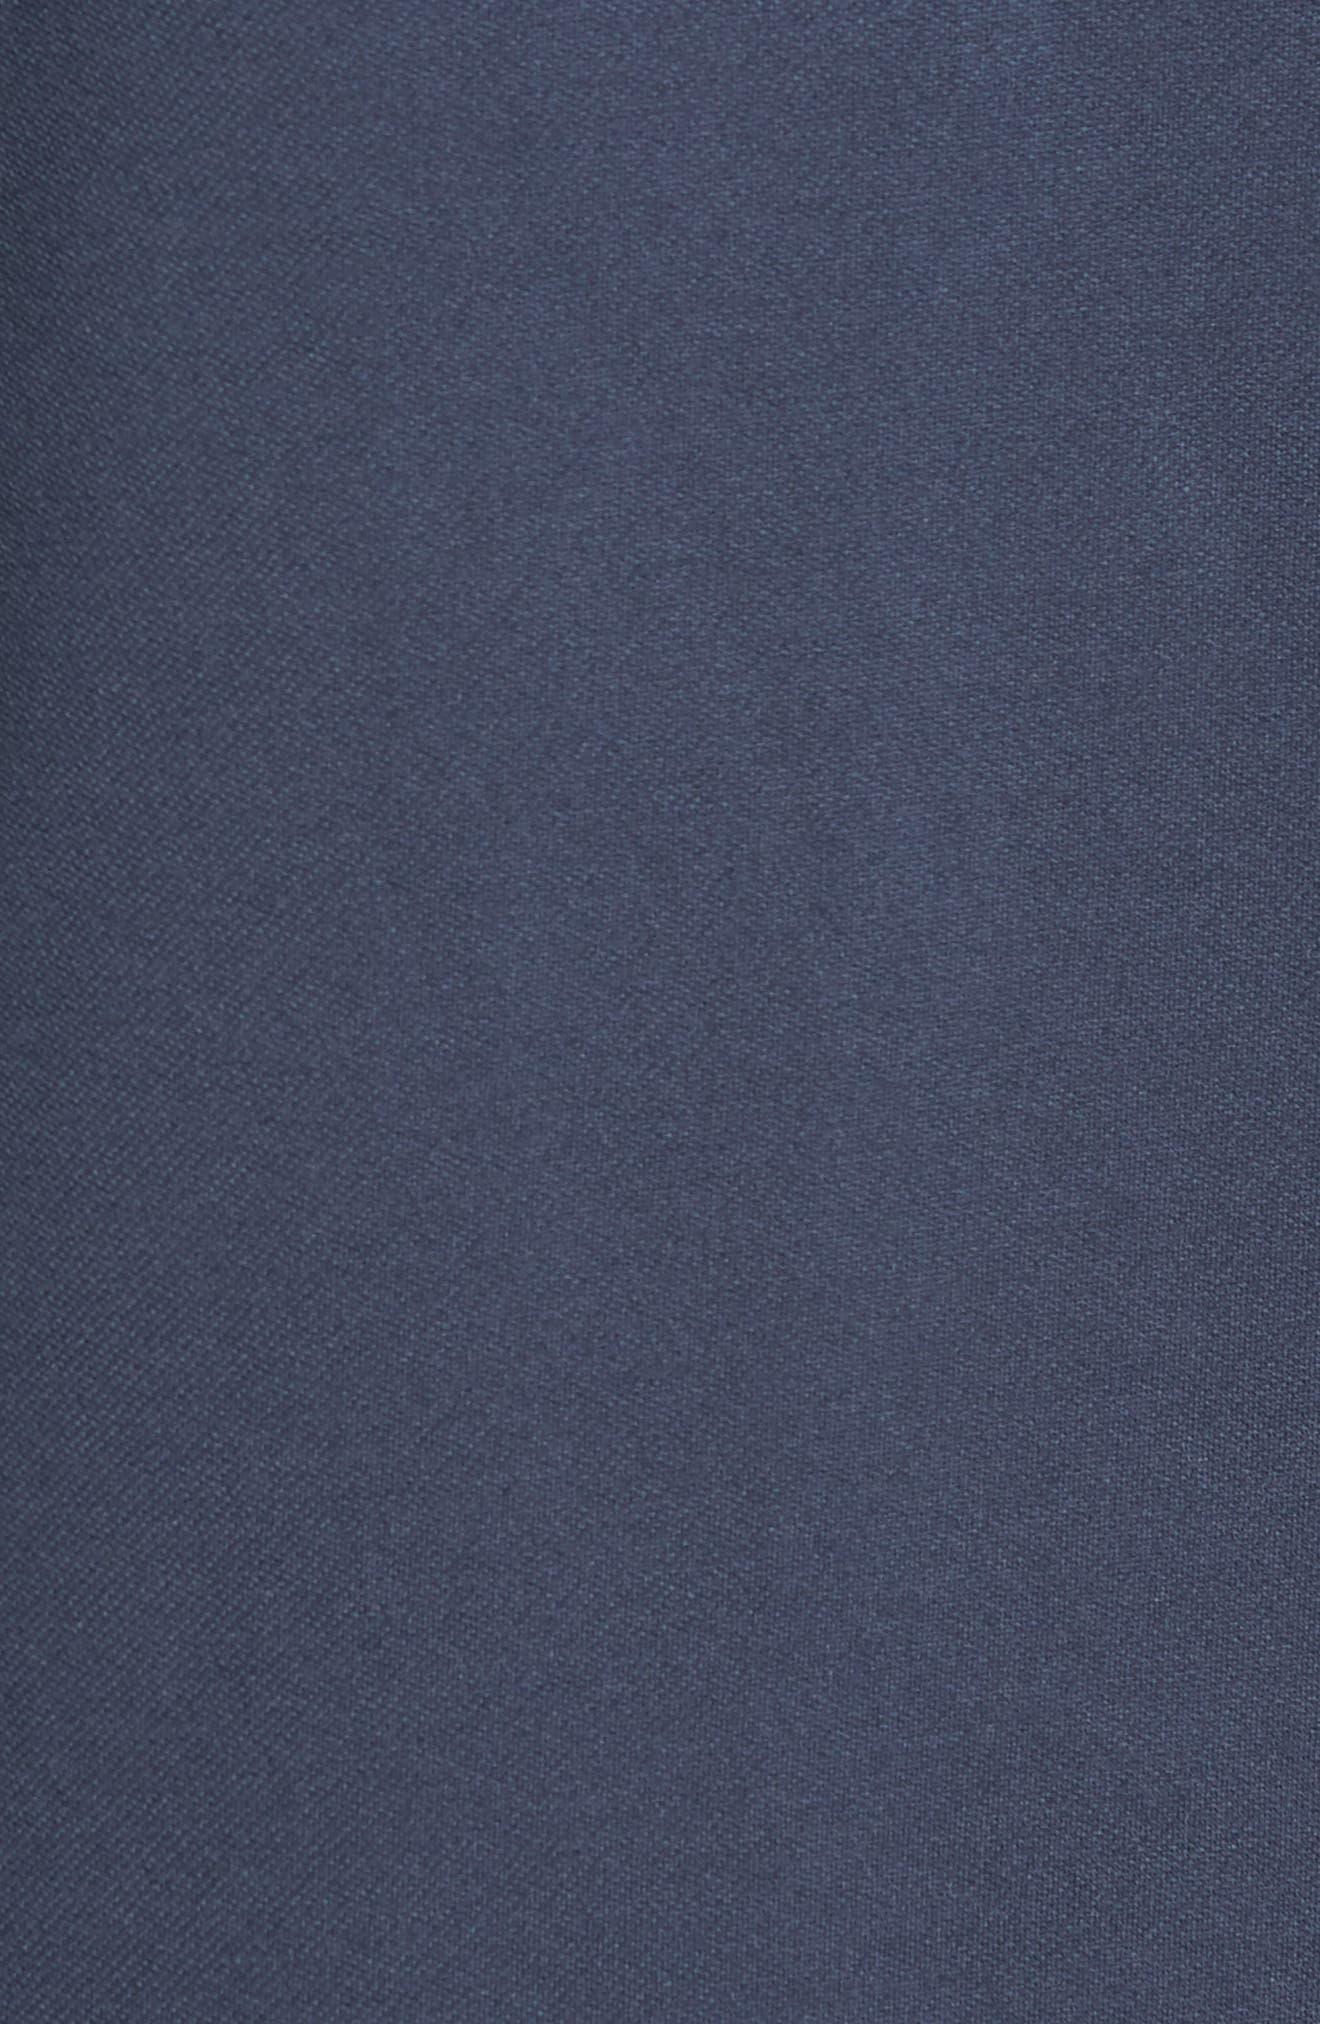 Kaibosh Regular Fit Polo,                             Alternate thumbnail 5, color,                             BLUE NIGHTS